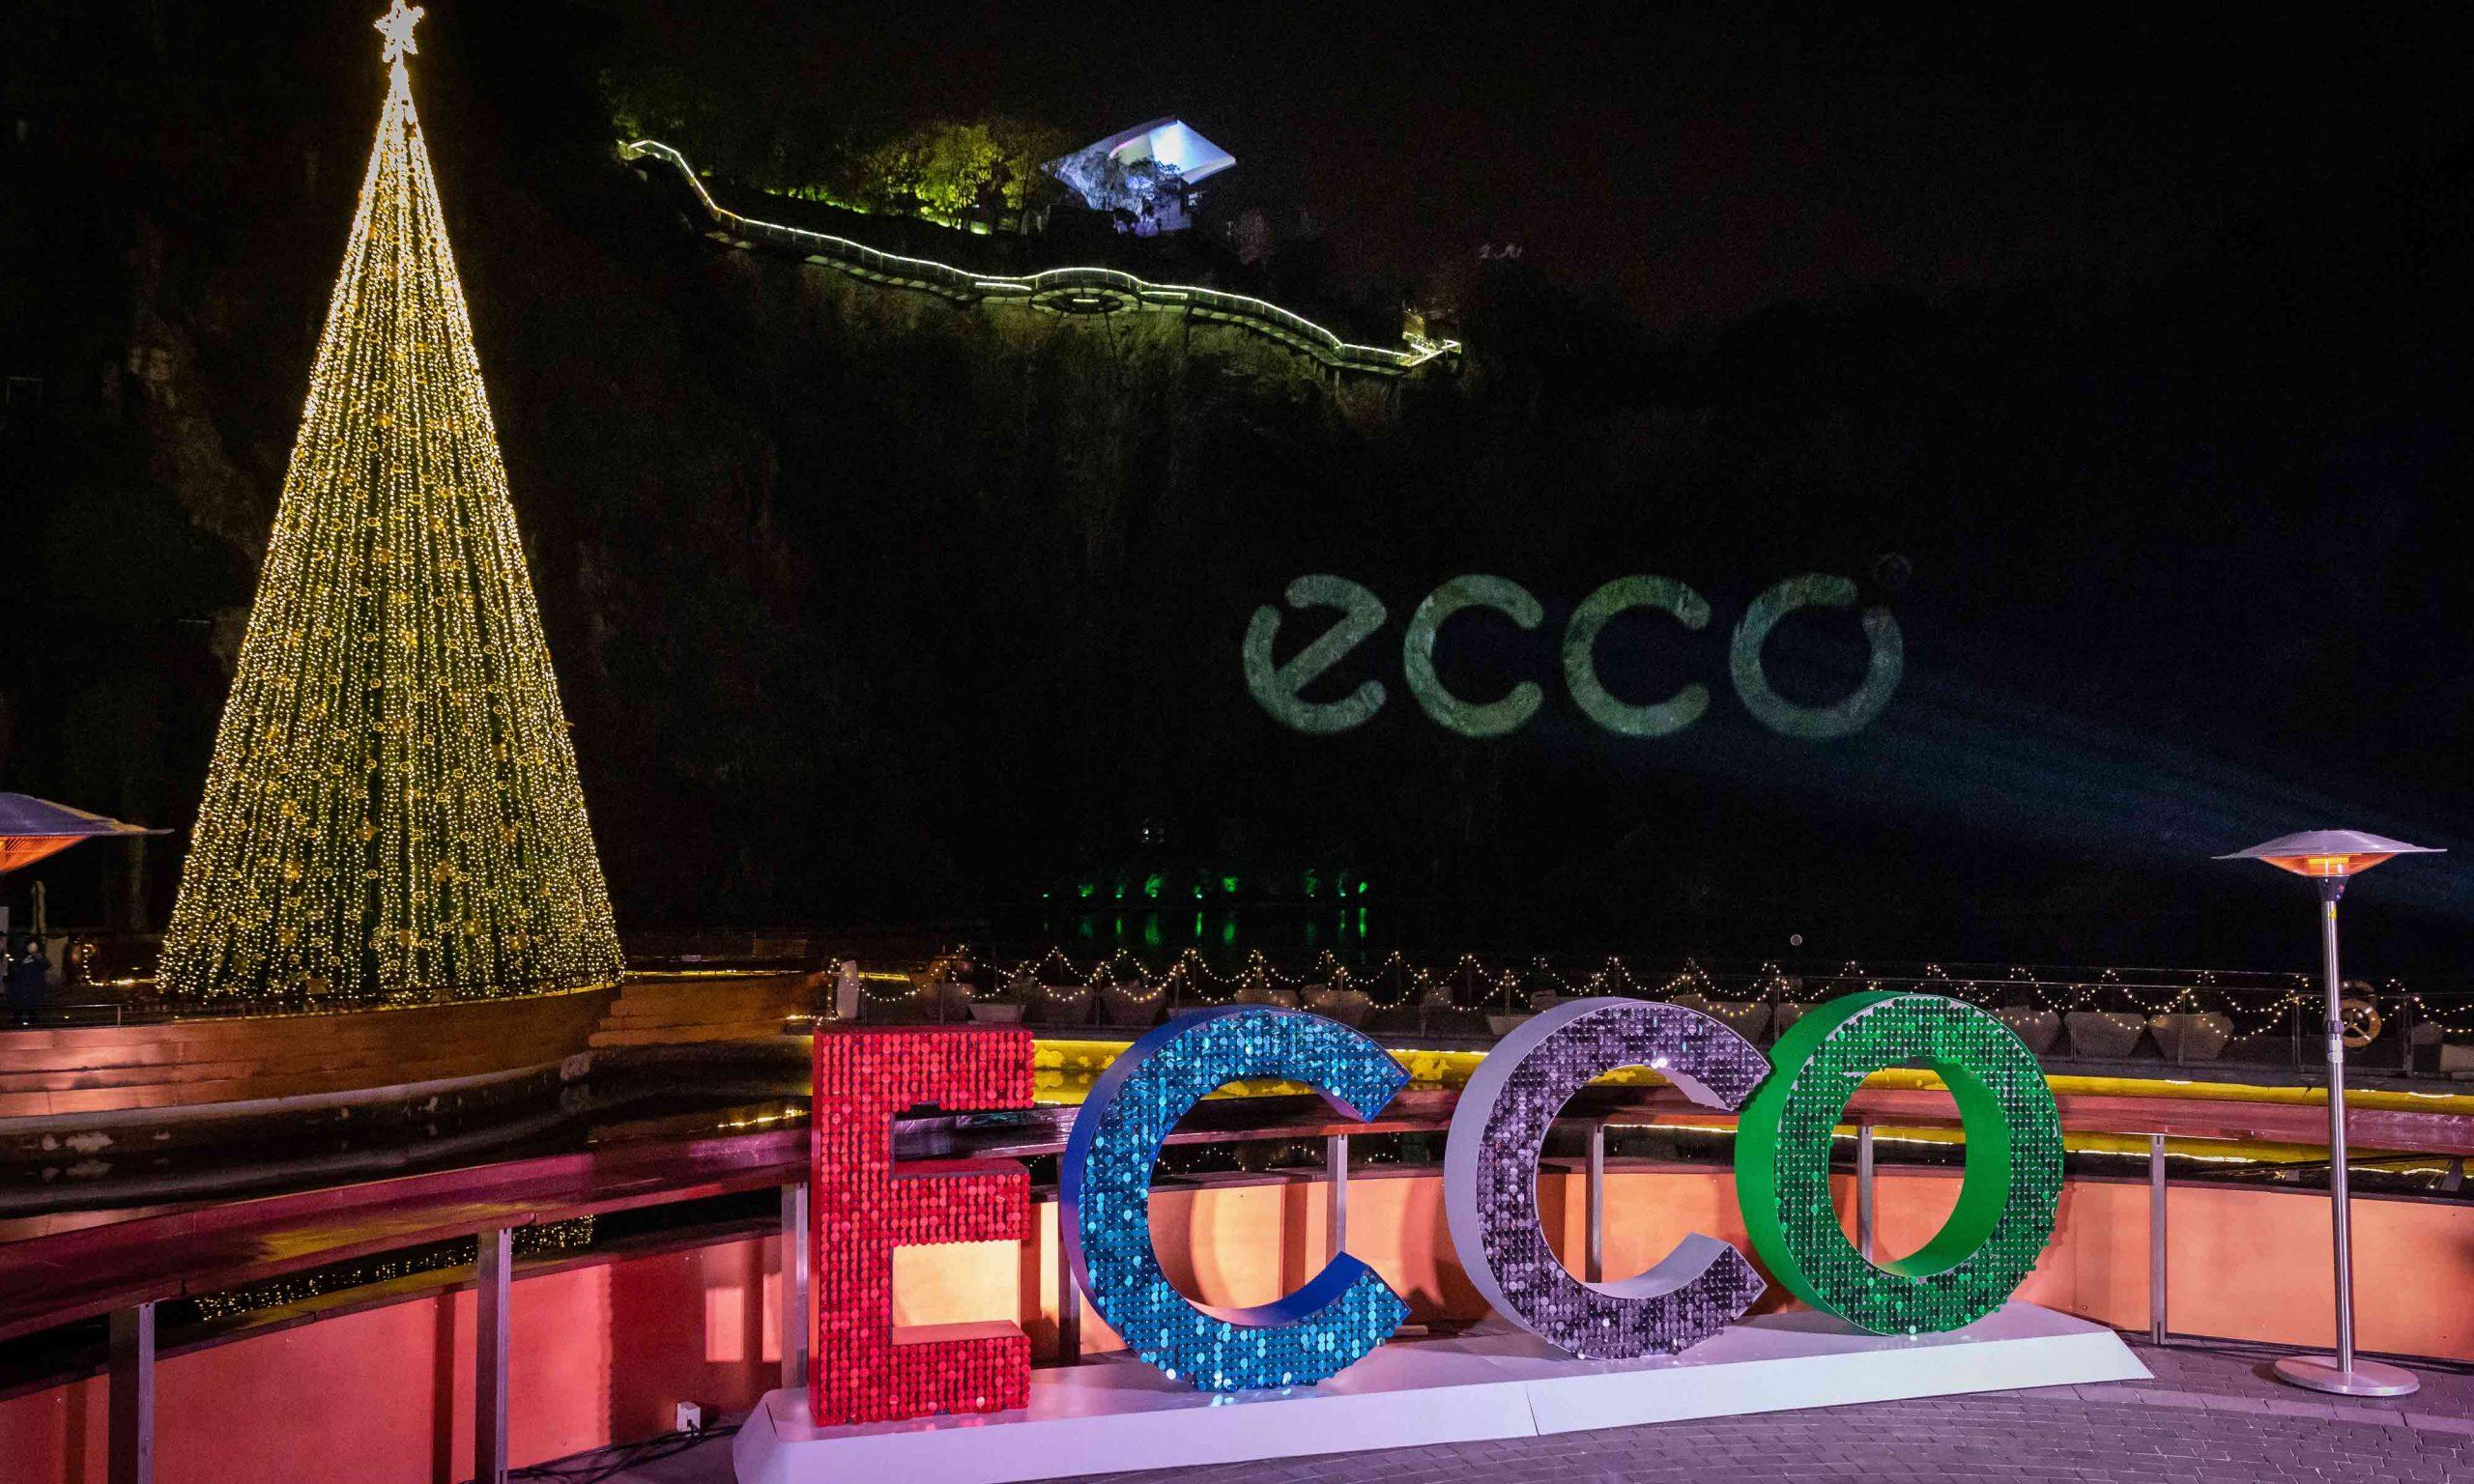 MOVES LIKE YOU,ECCO 2021 春夏系列新品预览